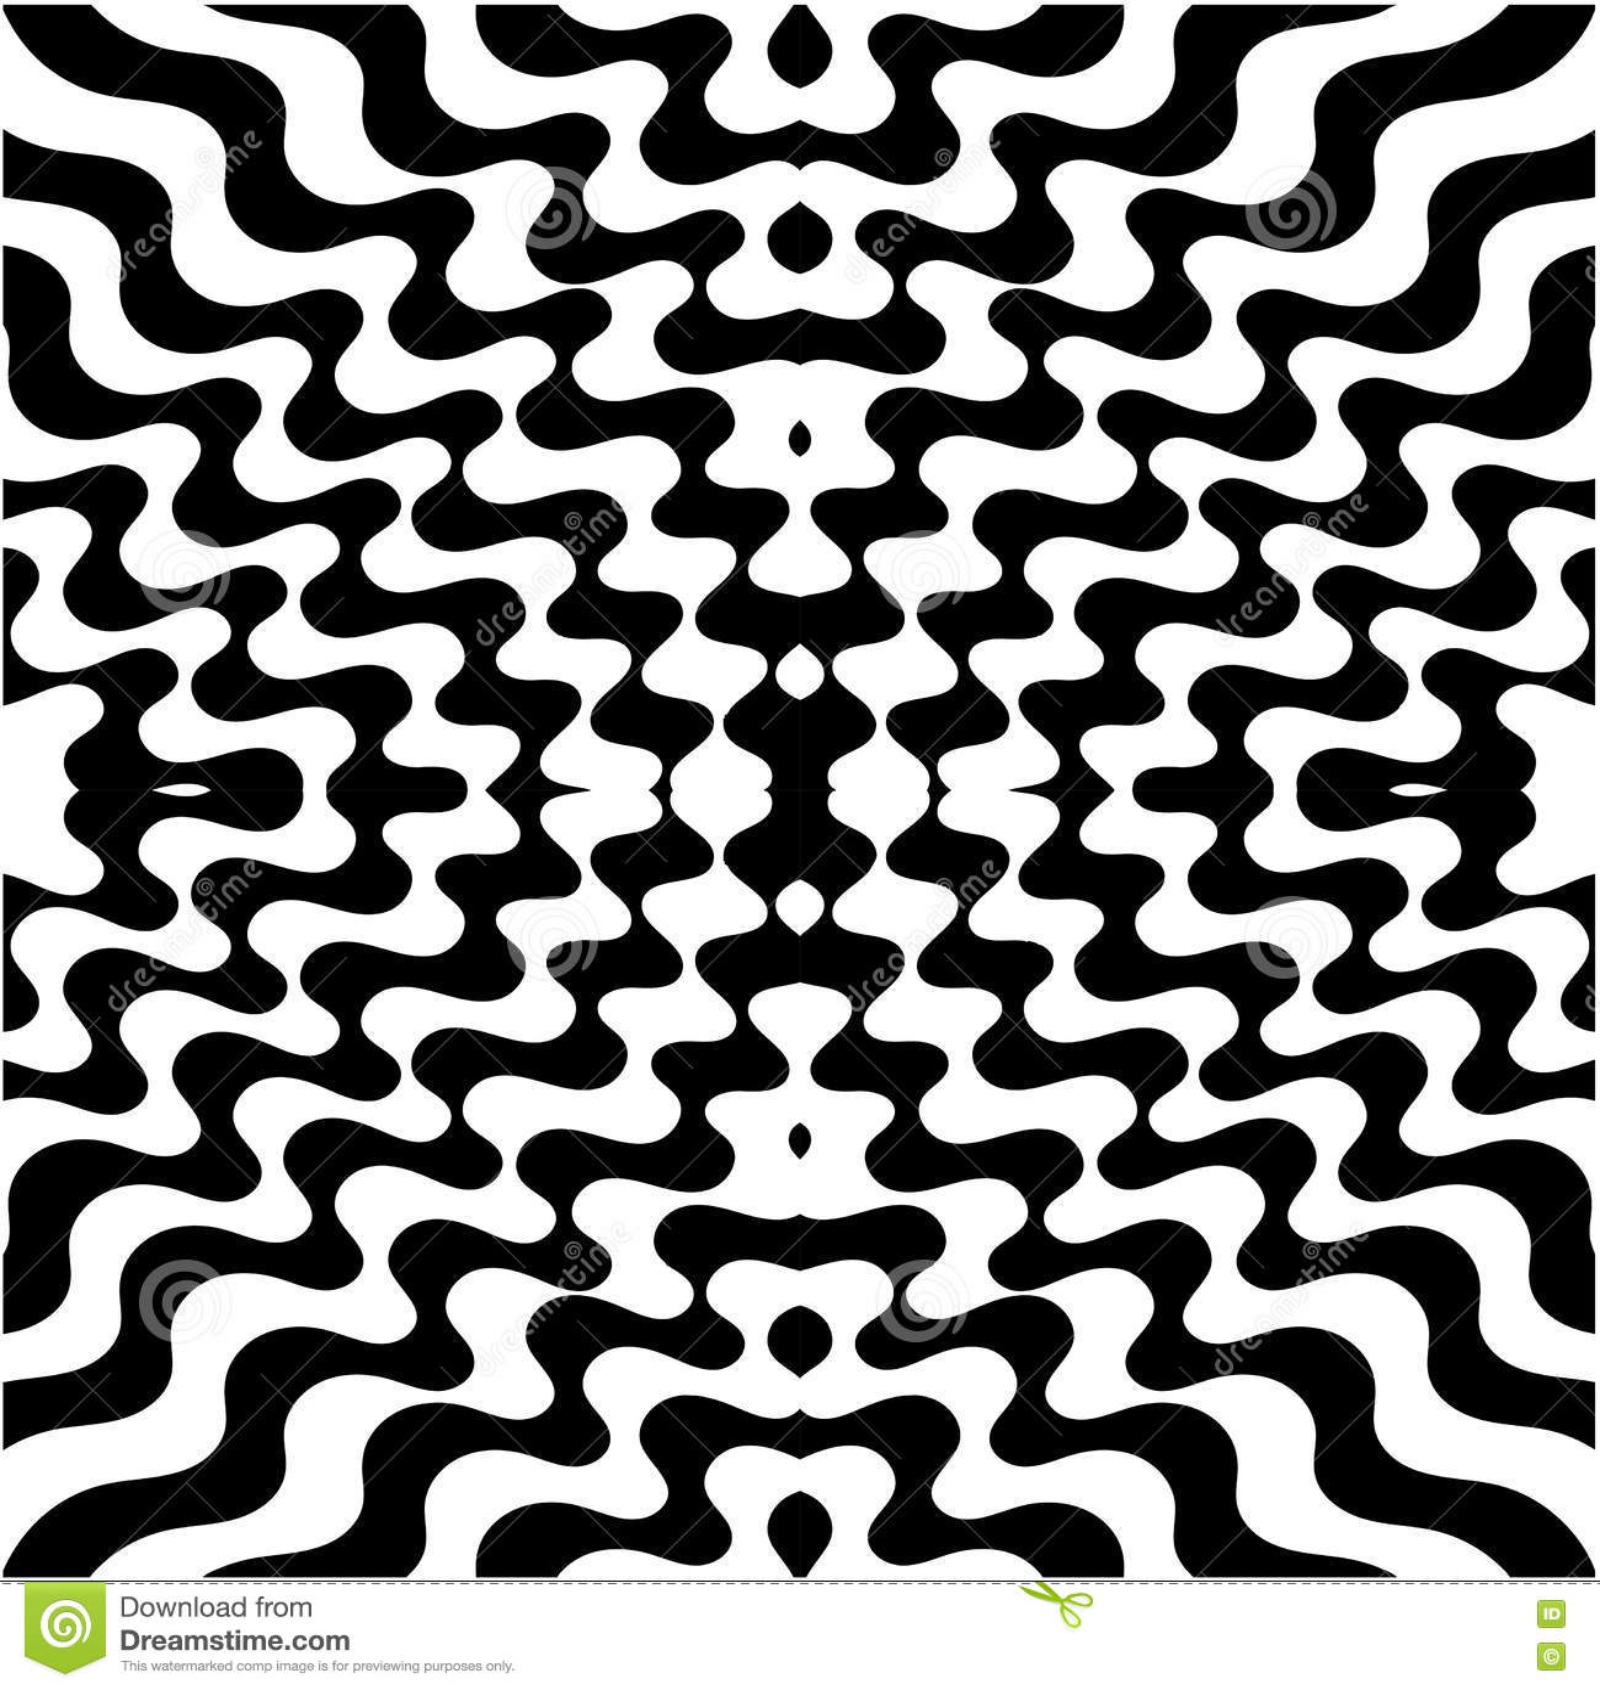 And black diagonal stripes background seamless background or wallpaper - Background Black Design Geometric Illustration Pattern Seamless Striped Surface Vintage Wallpaper